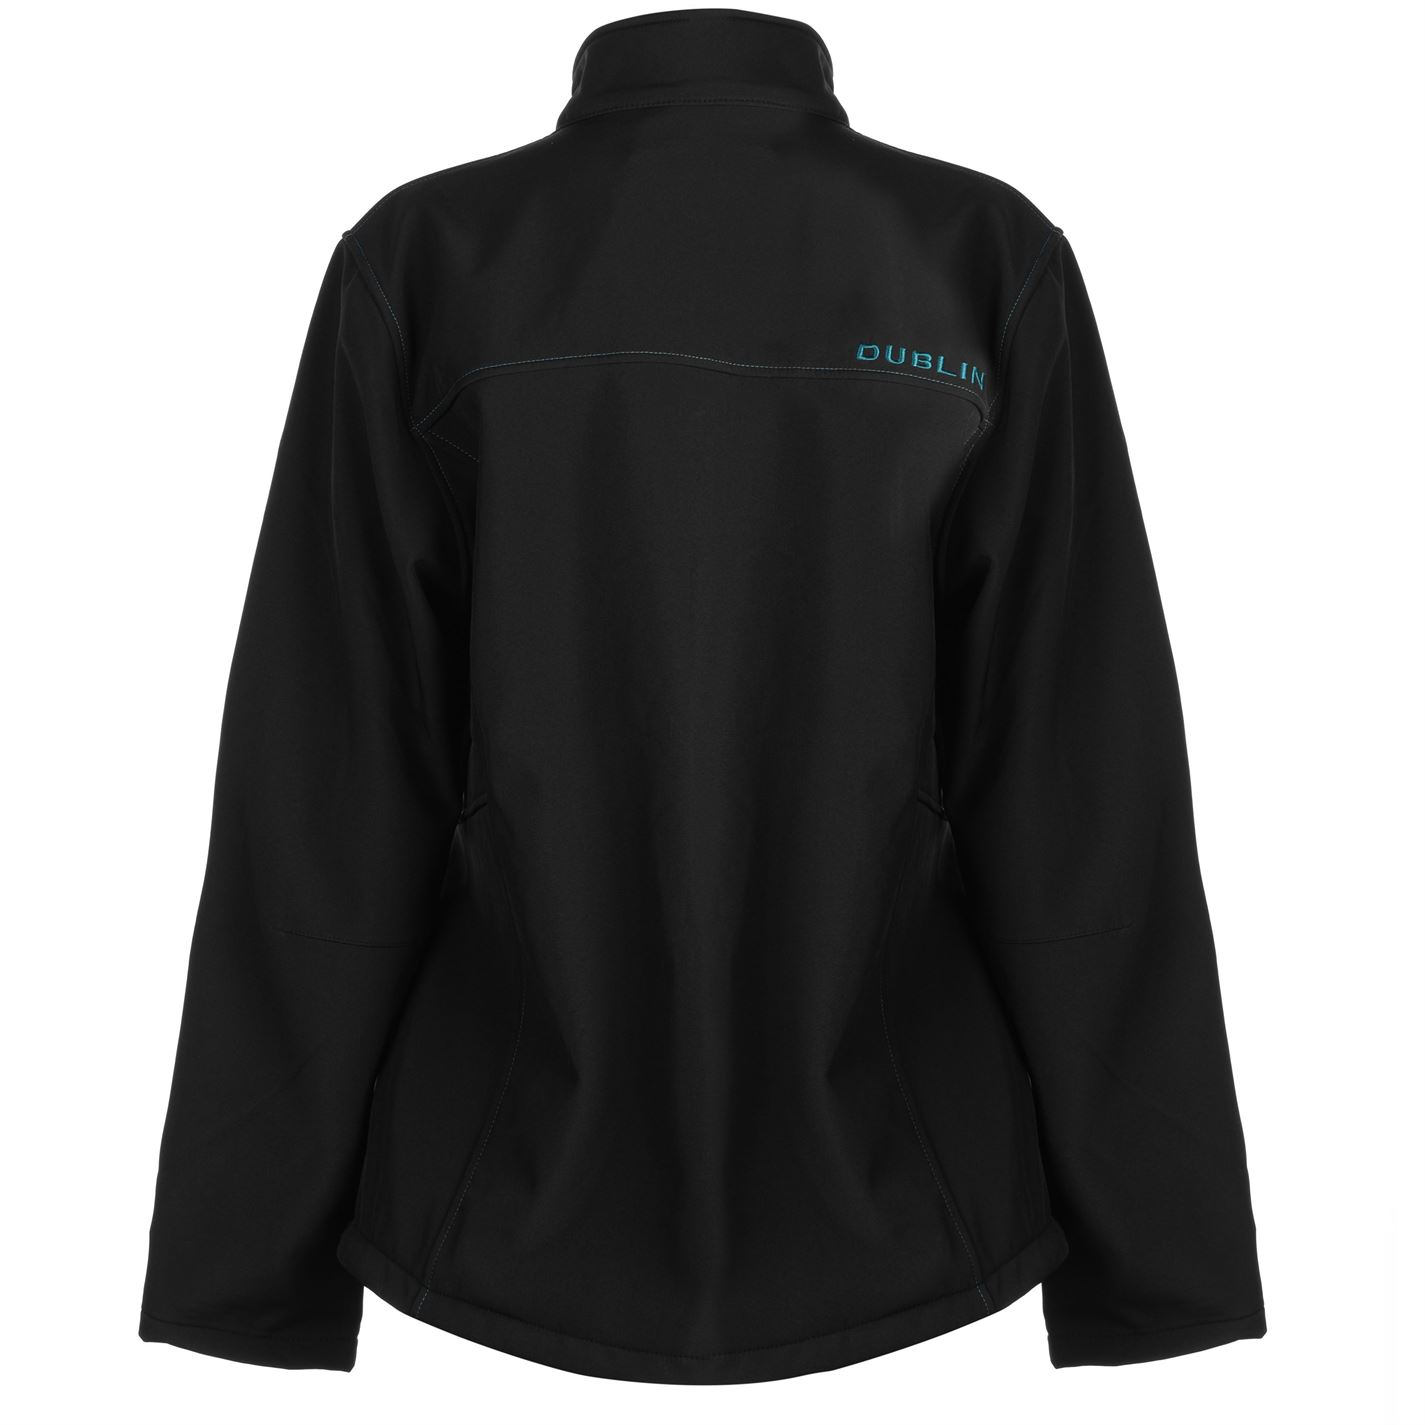 Dublin Sachi Softshell Jacket Ladies Equestrian Coat Top Full Length Sleeve Zip